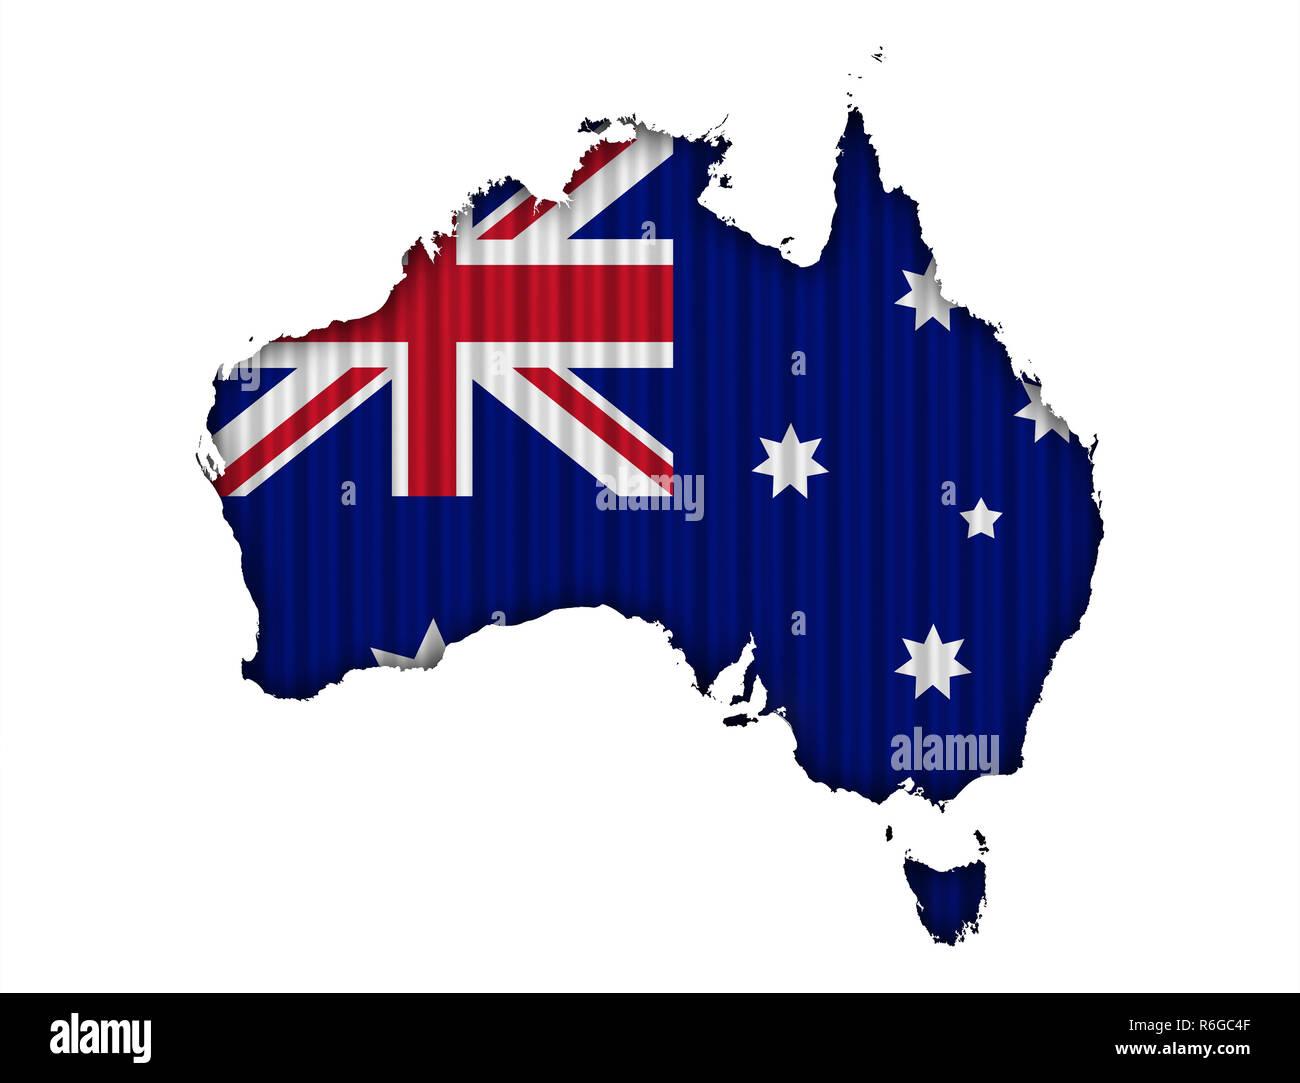 Australia Map In R.Map Of Australia On Texture R Stock Photo 227783487 Alamy